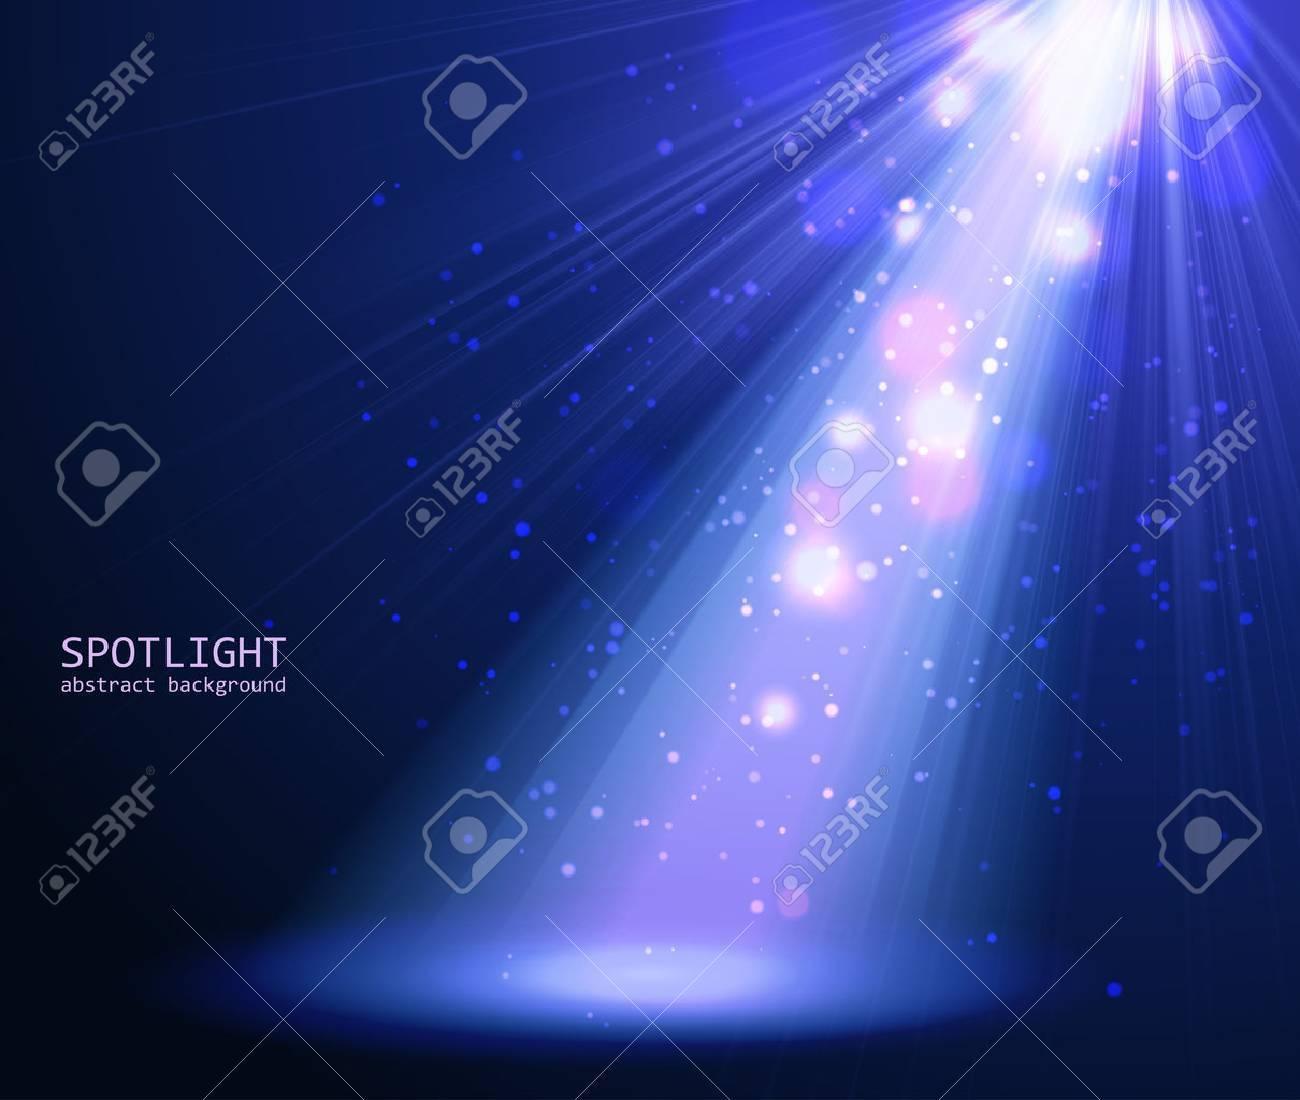 Abstract blue spotlight background. Vector illustration eps 10 - 34172591